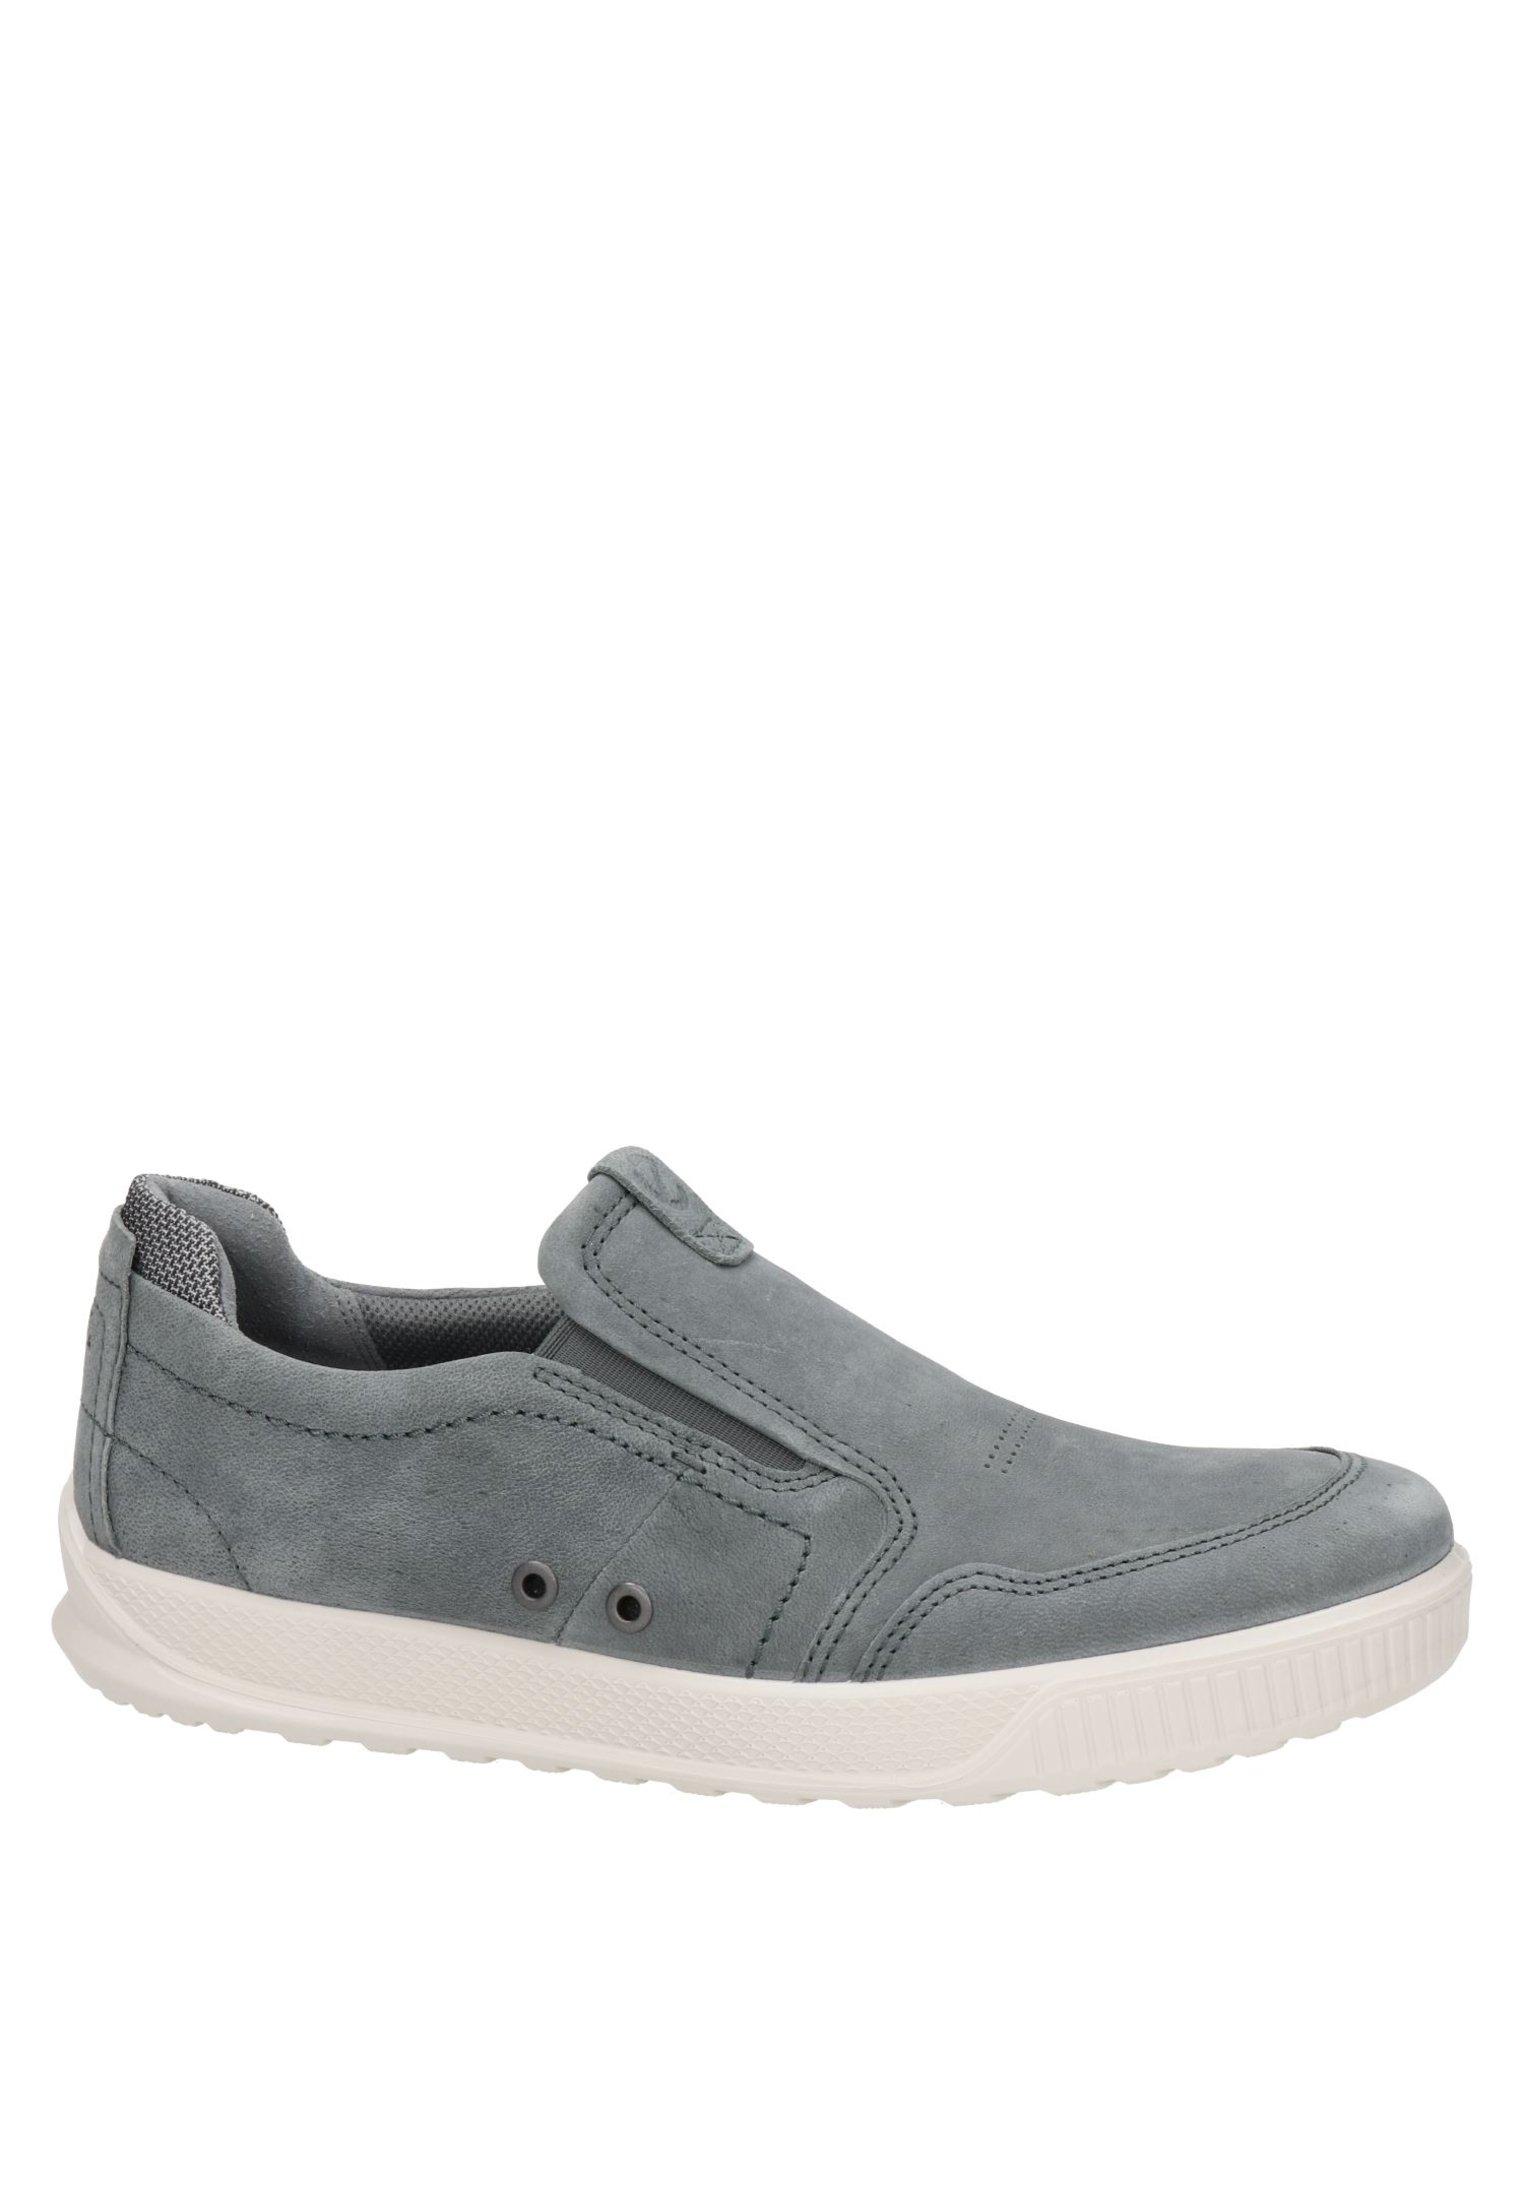 ECCO Slipper - grijs/grau - Herrenschuhe TXWYw